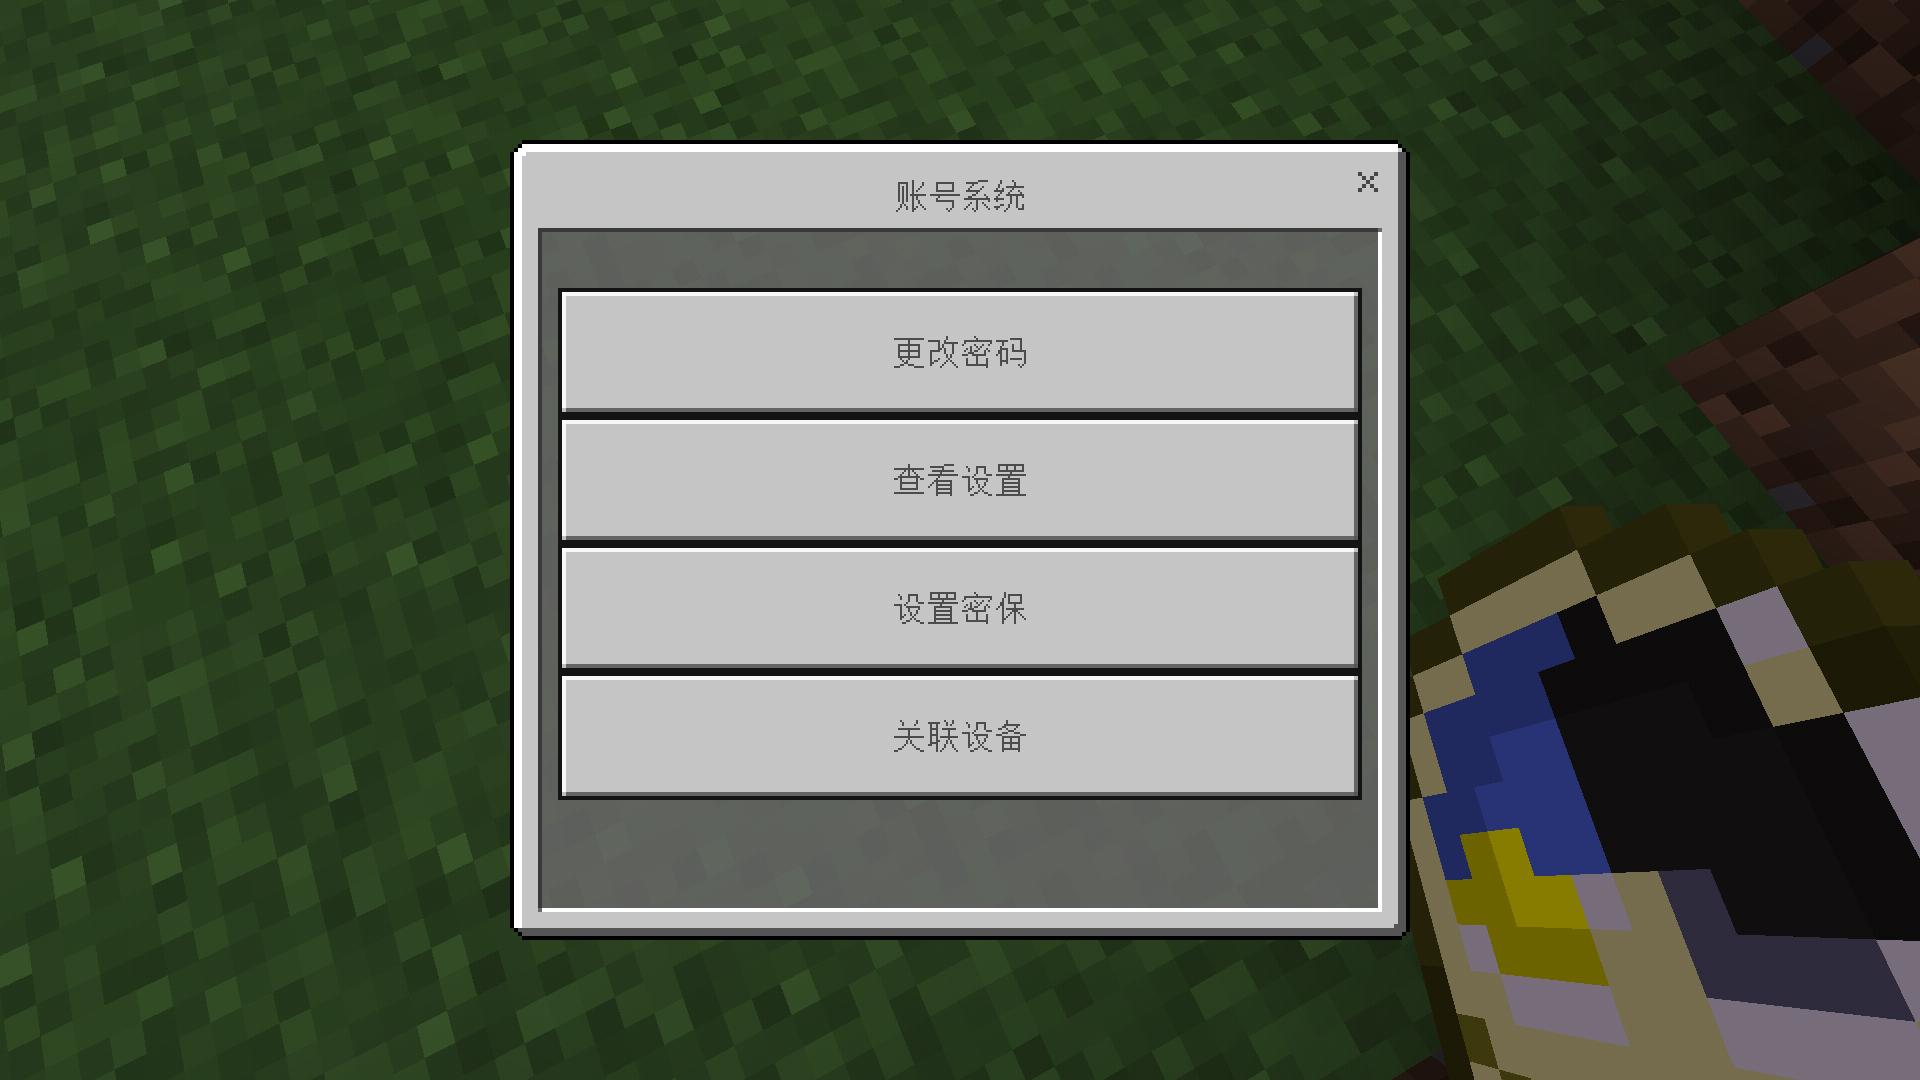 Screenshot_2018-07-14-21-26-41-211_com.mojang.minecraftpe.png